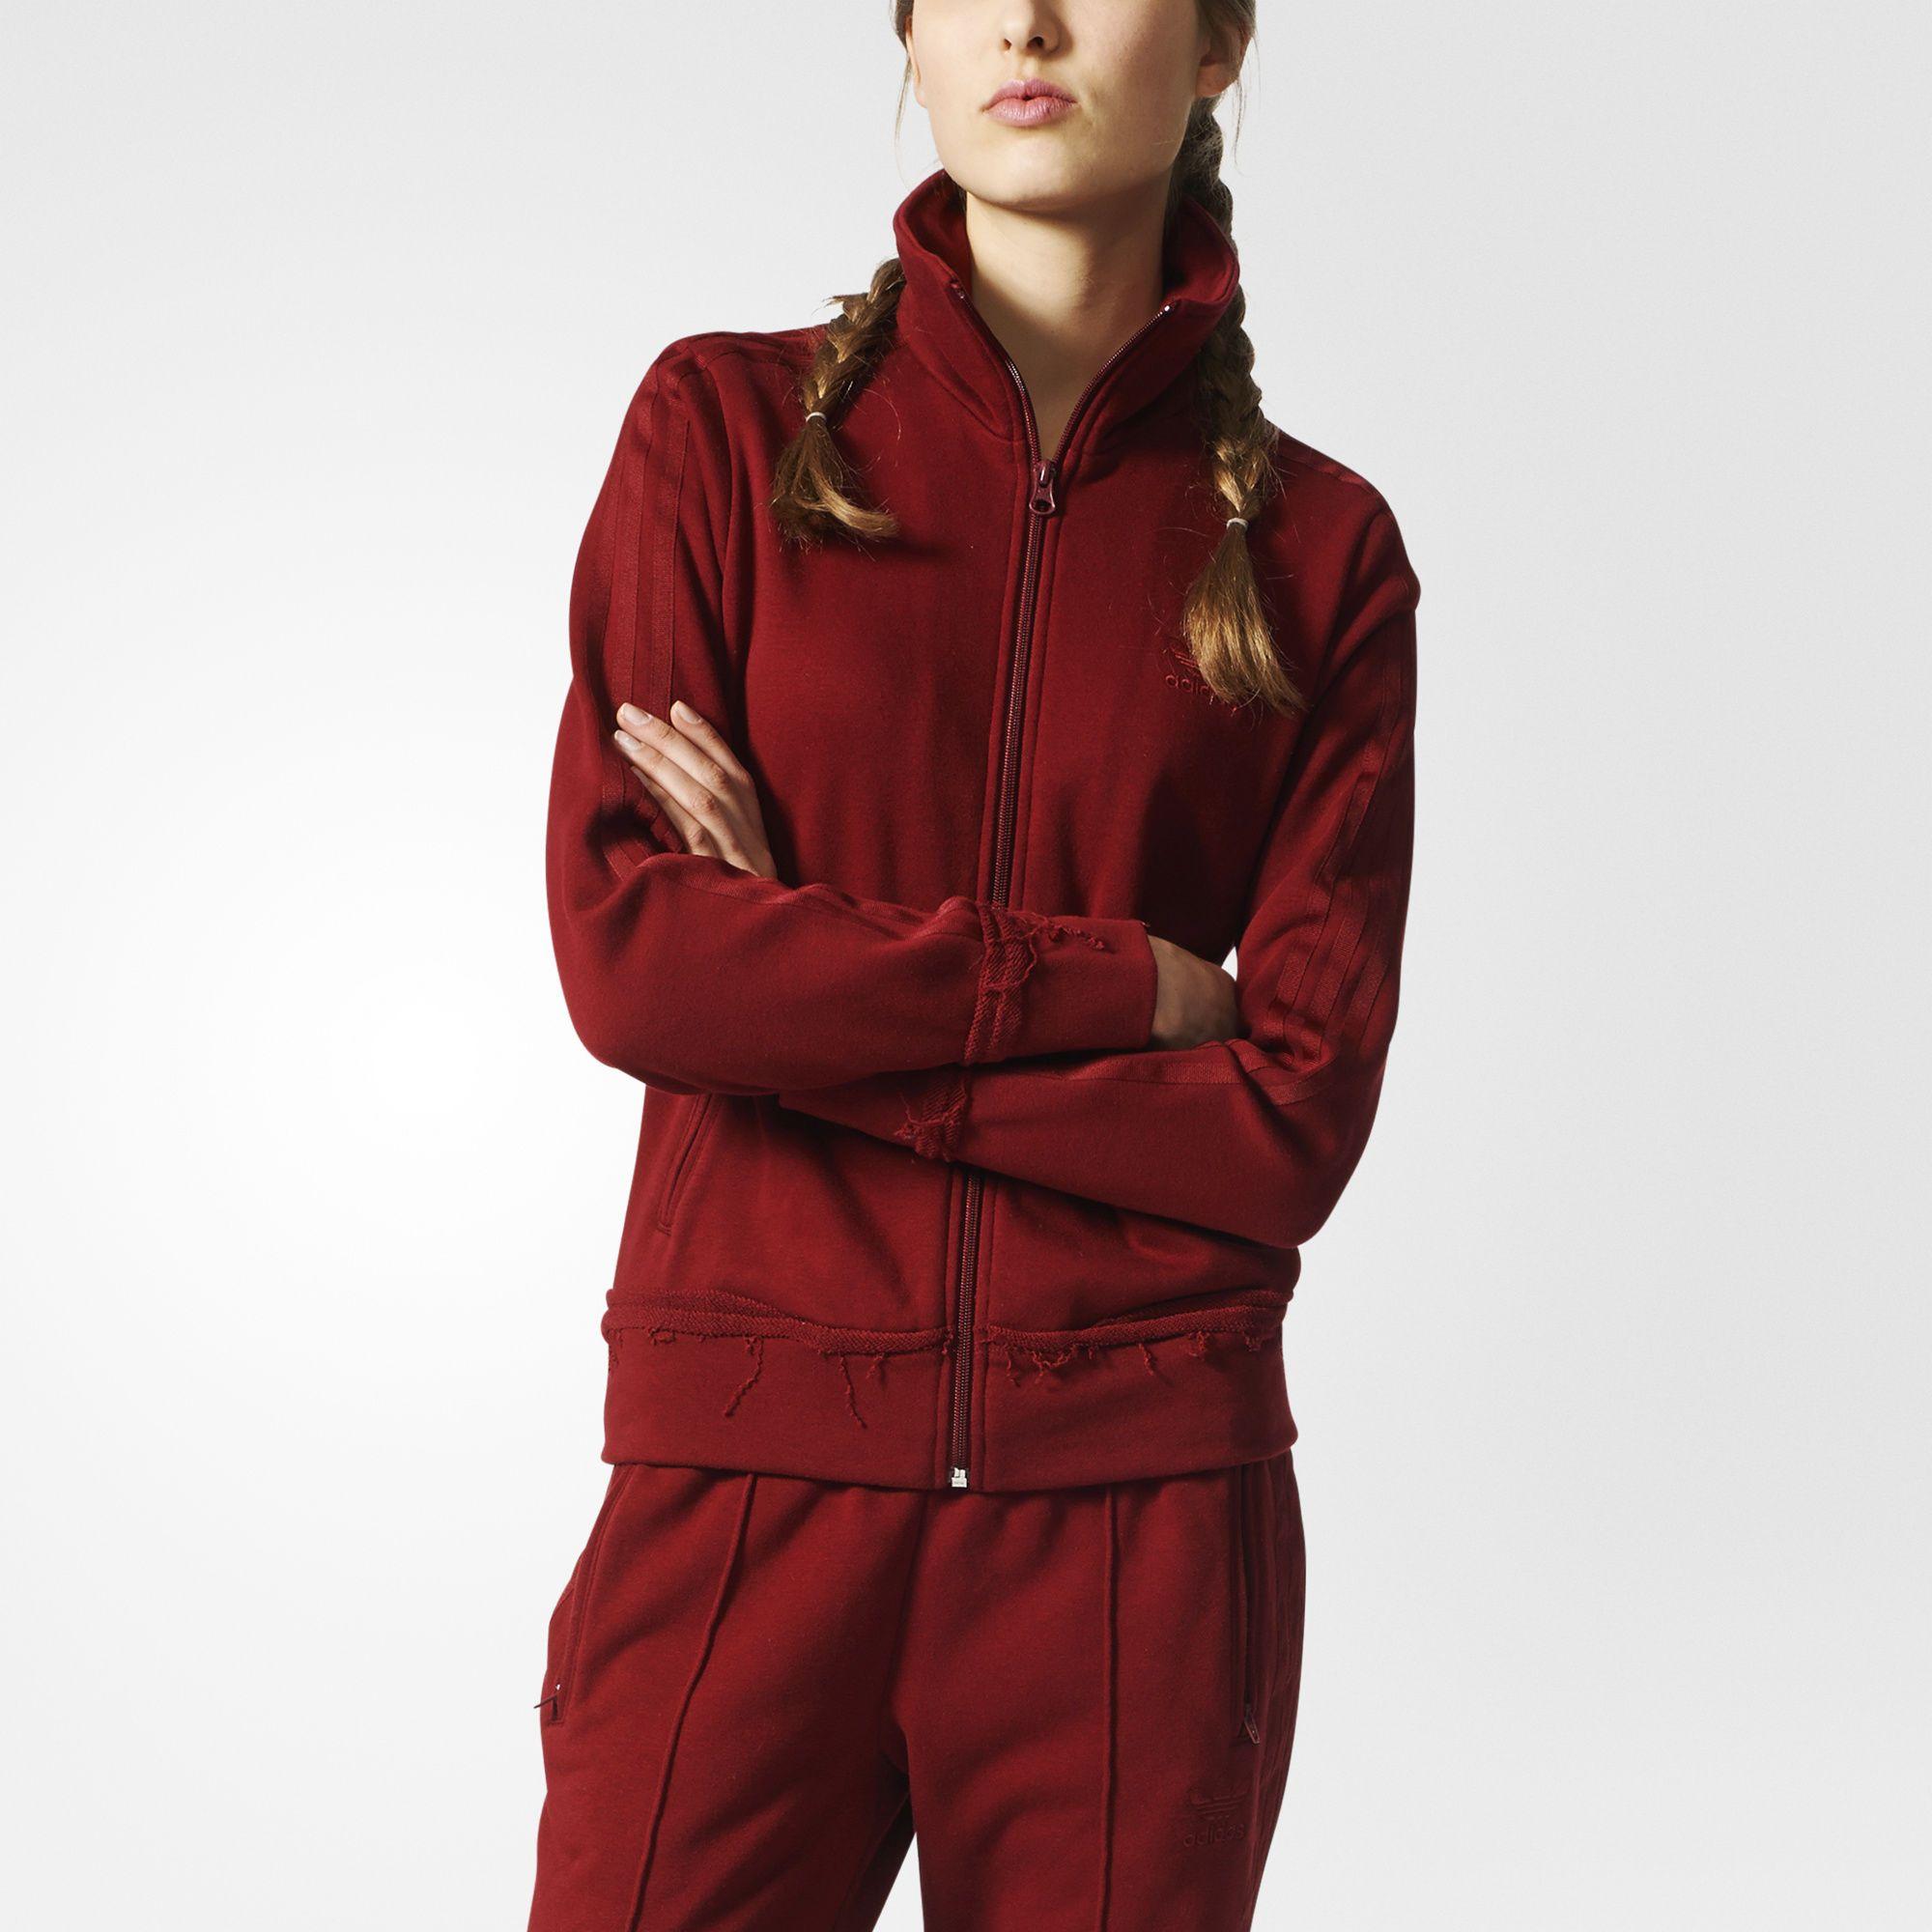 adidas Firebird Track Jacket Women's Official adidas eBay